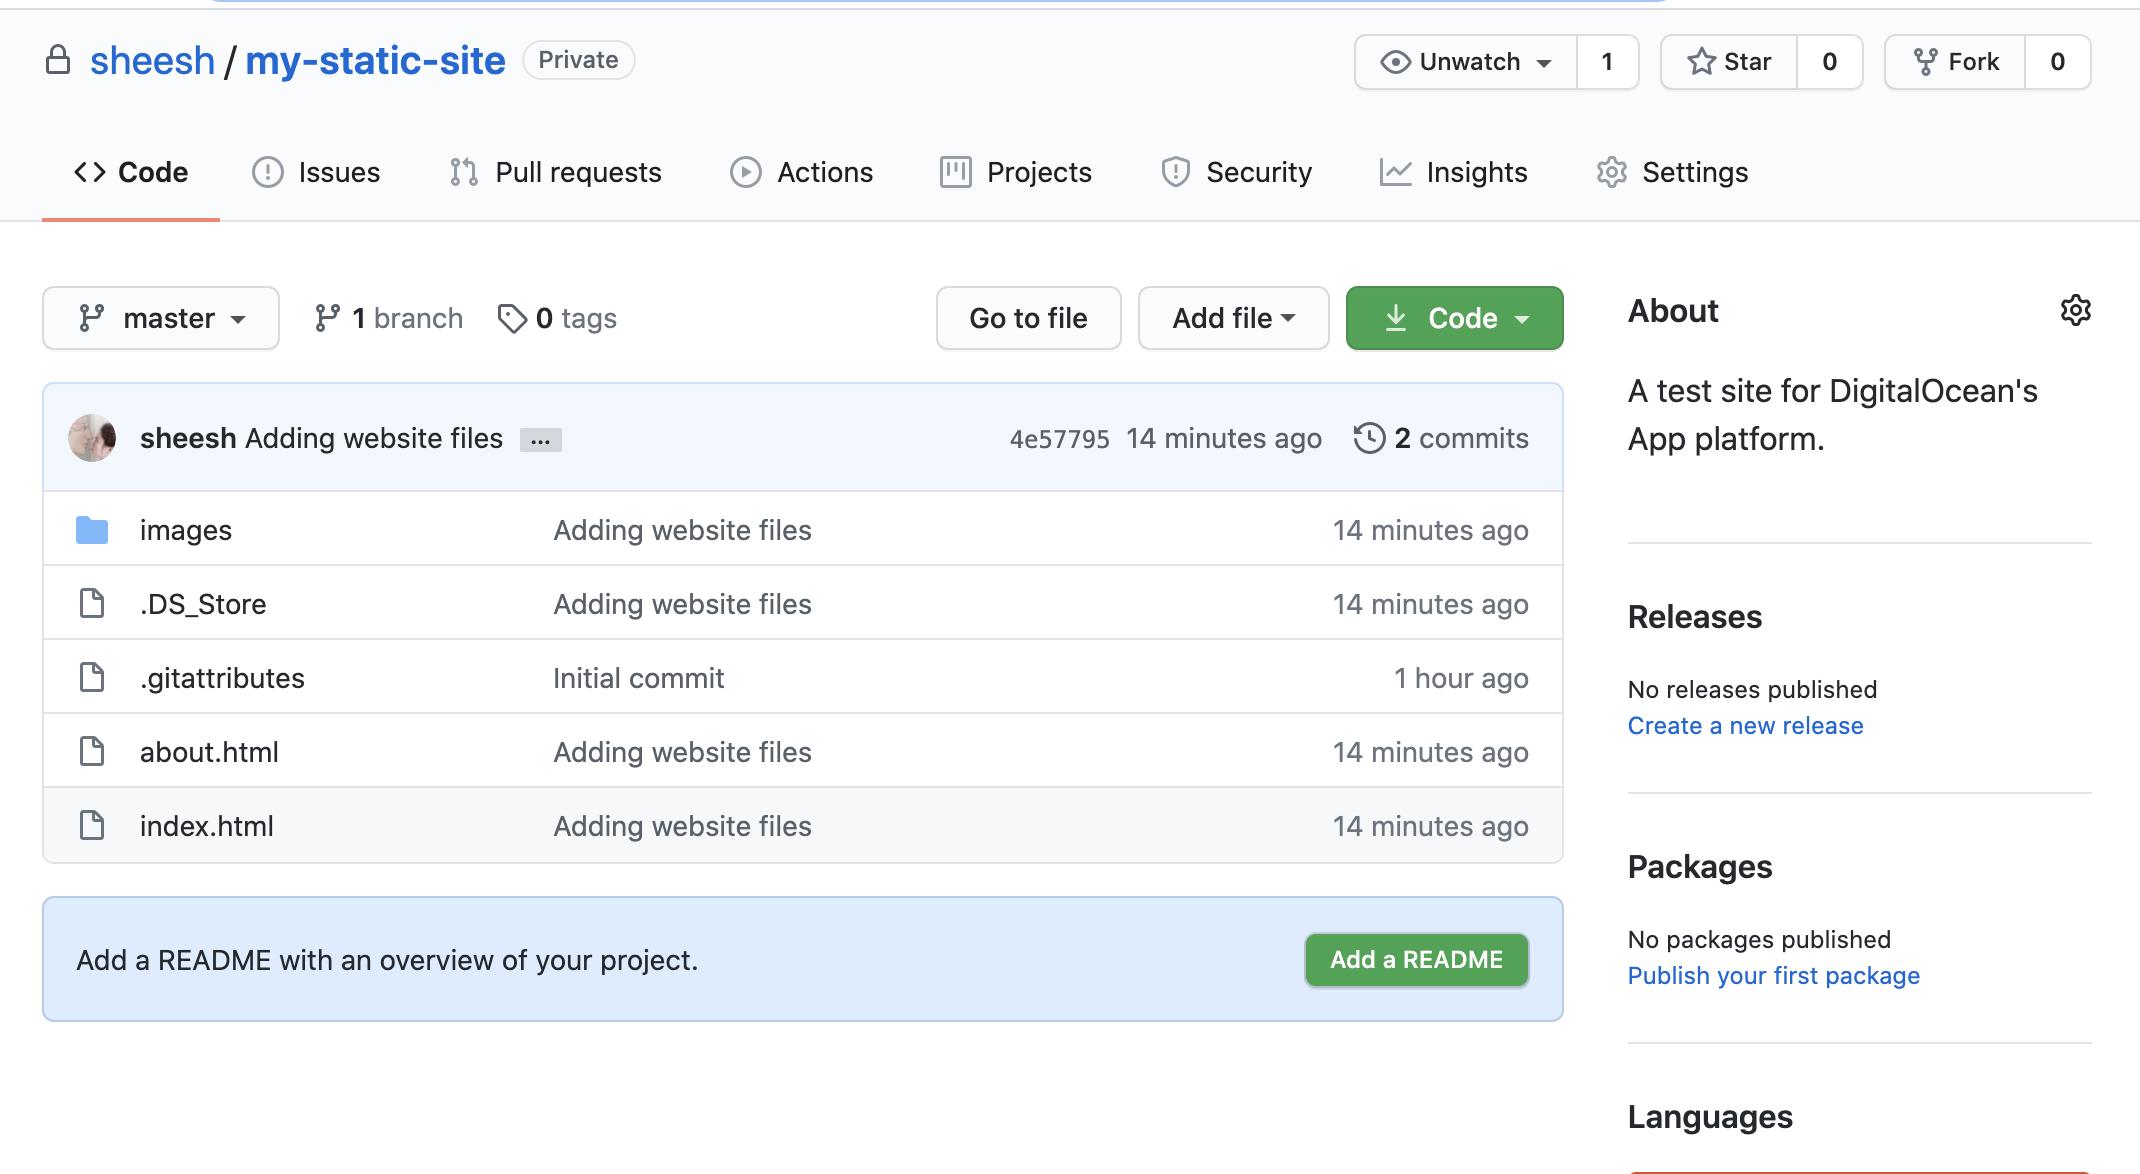 Image of repository on GitHub.com